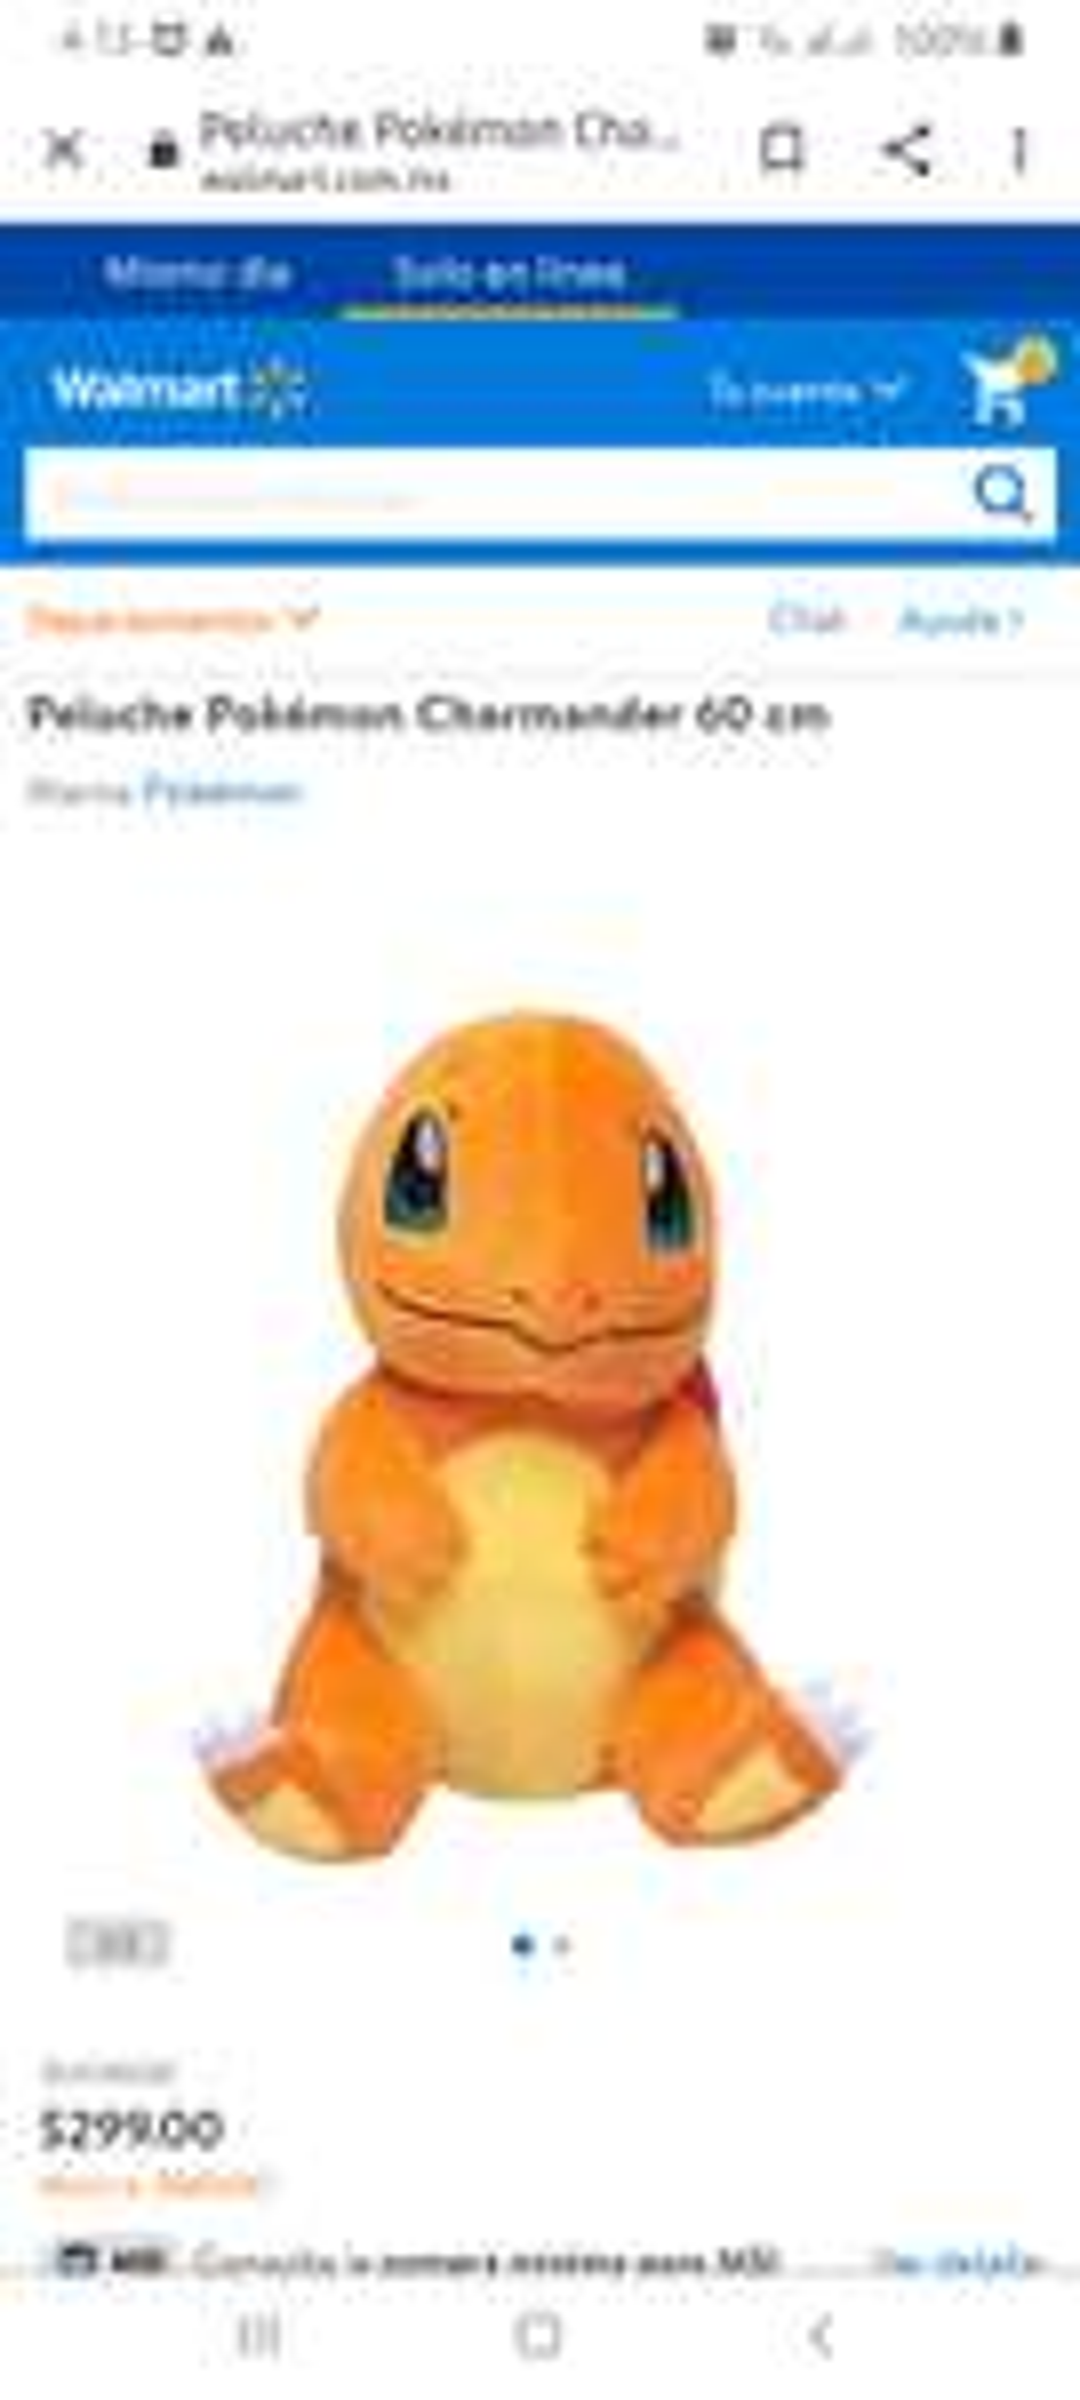 Walmart Peluche Pokémon Charmander 60 cm